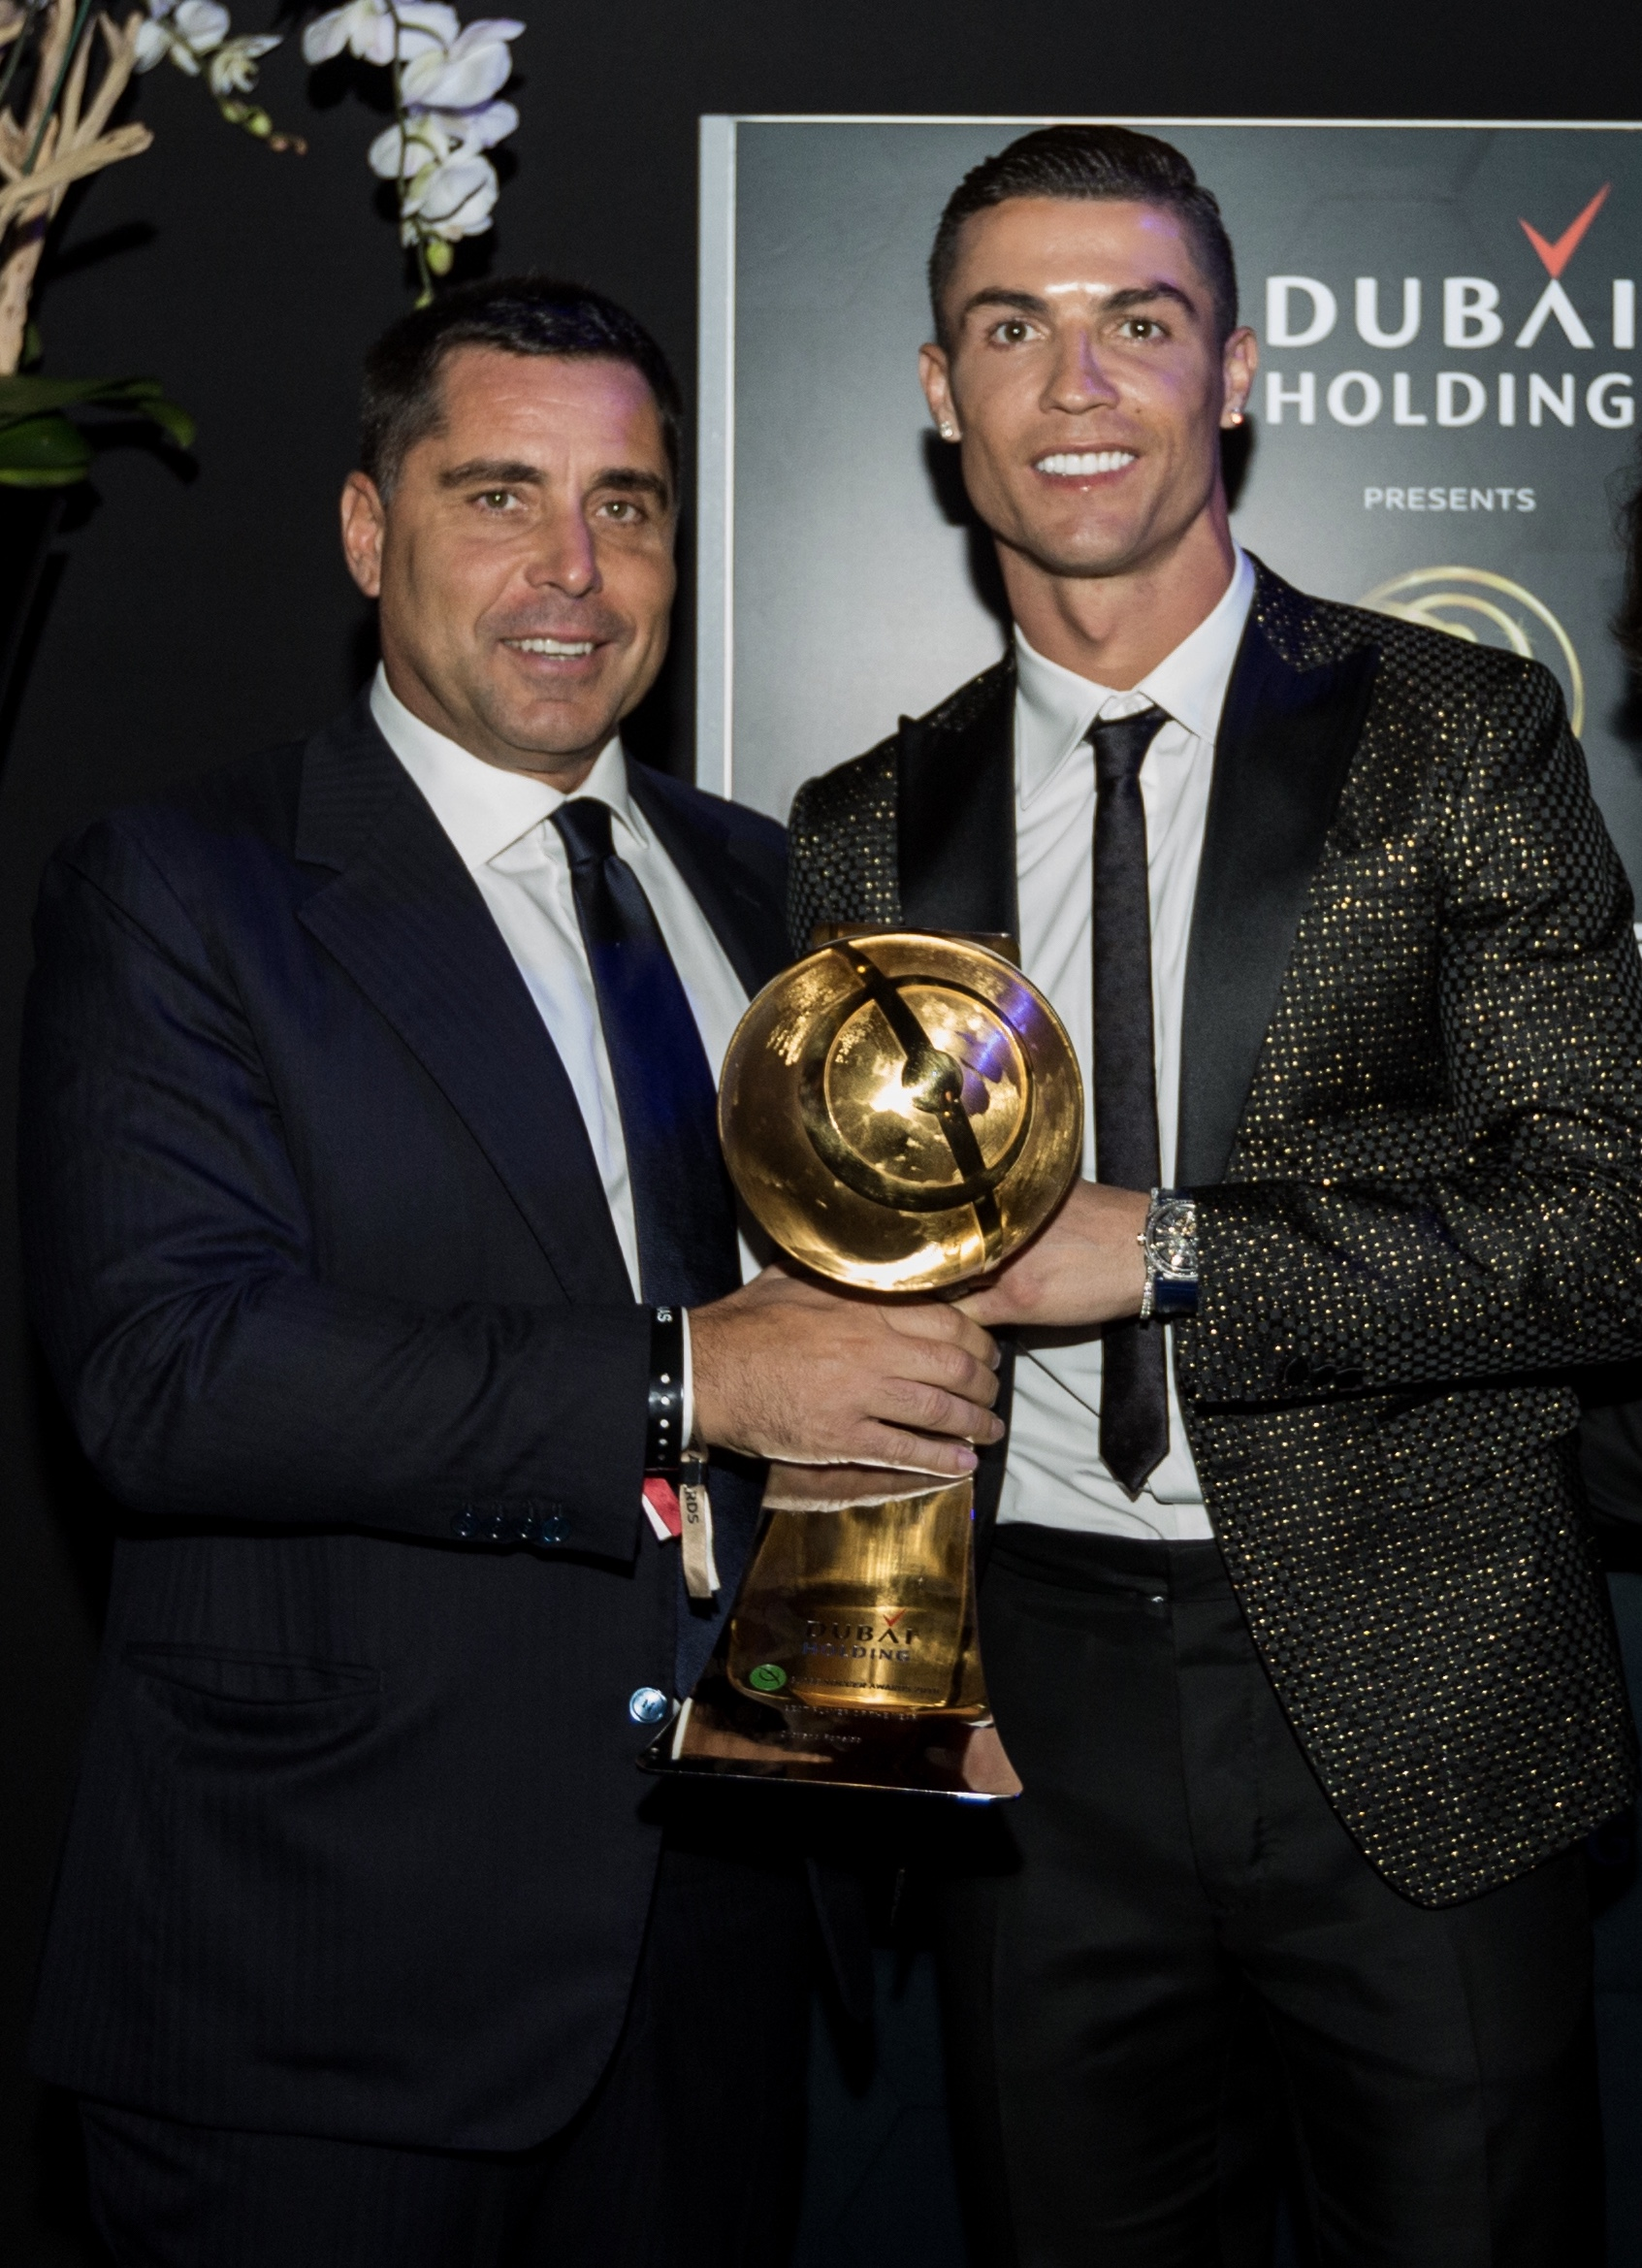 Riccardo Silva and Cristiano Ronaldo at Globe Soccer in Dubai